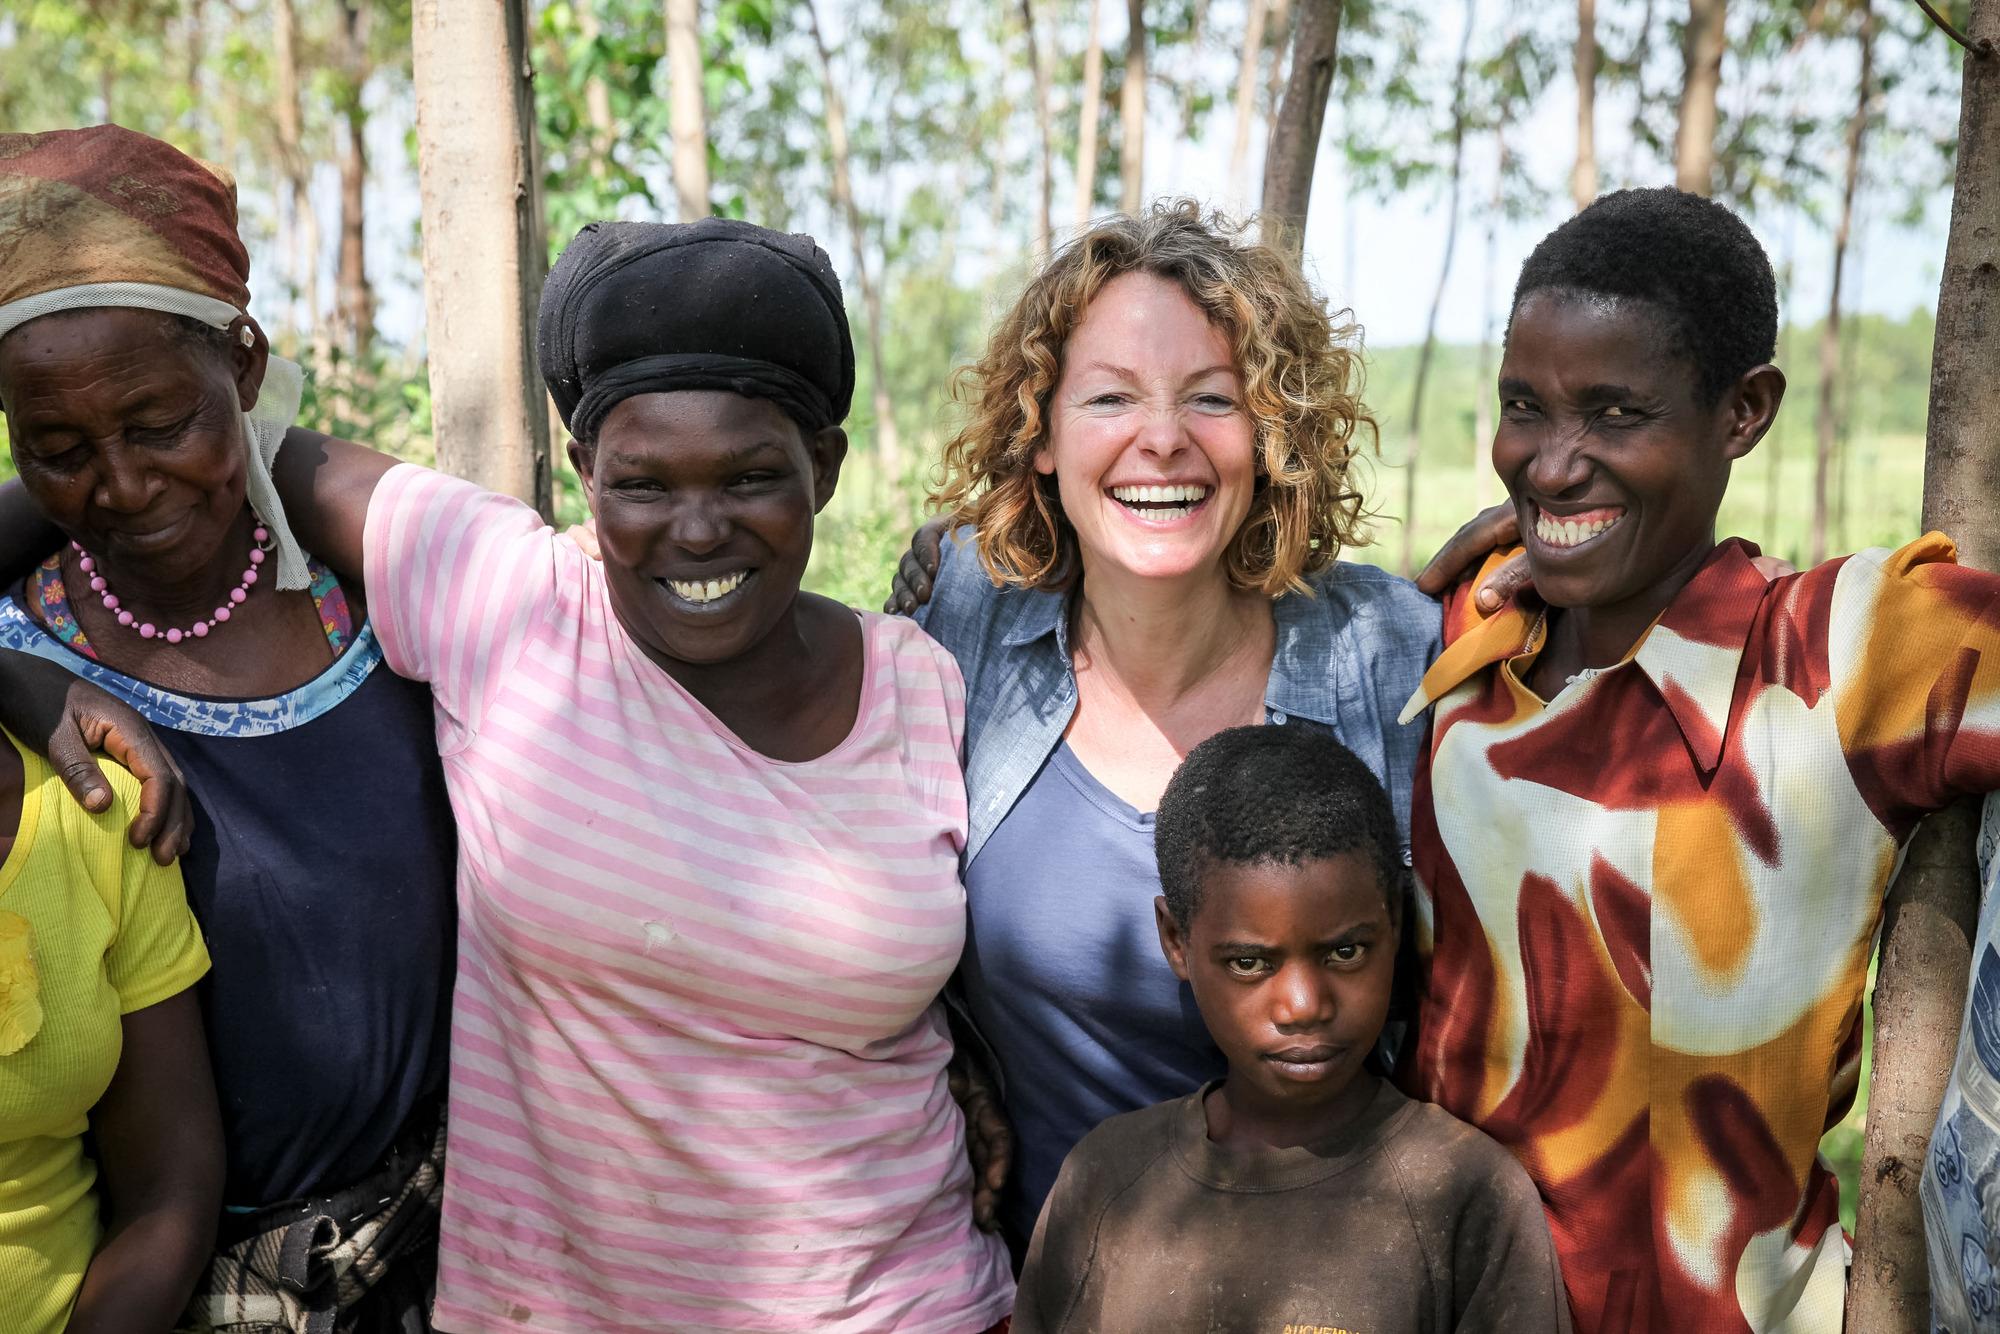 Kate Humble in Kenya (BBC, TL)